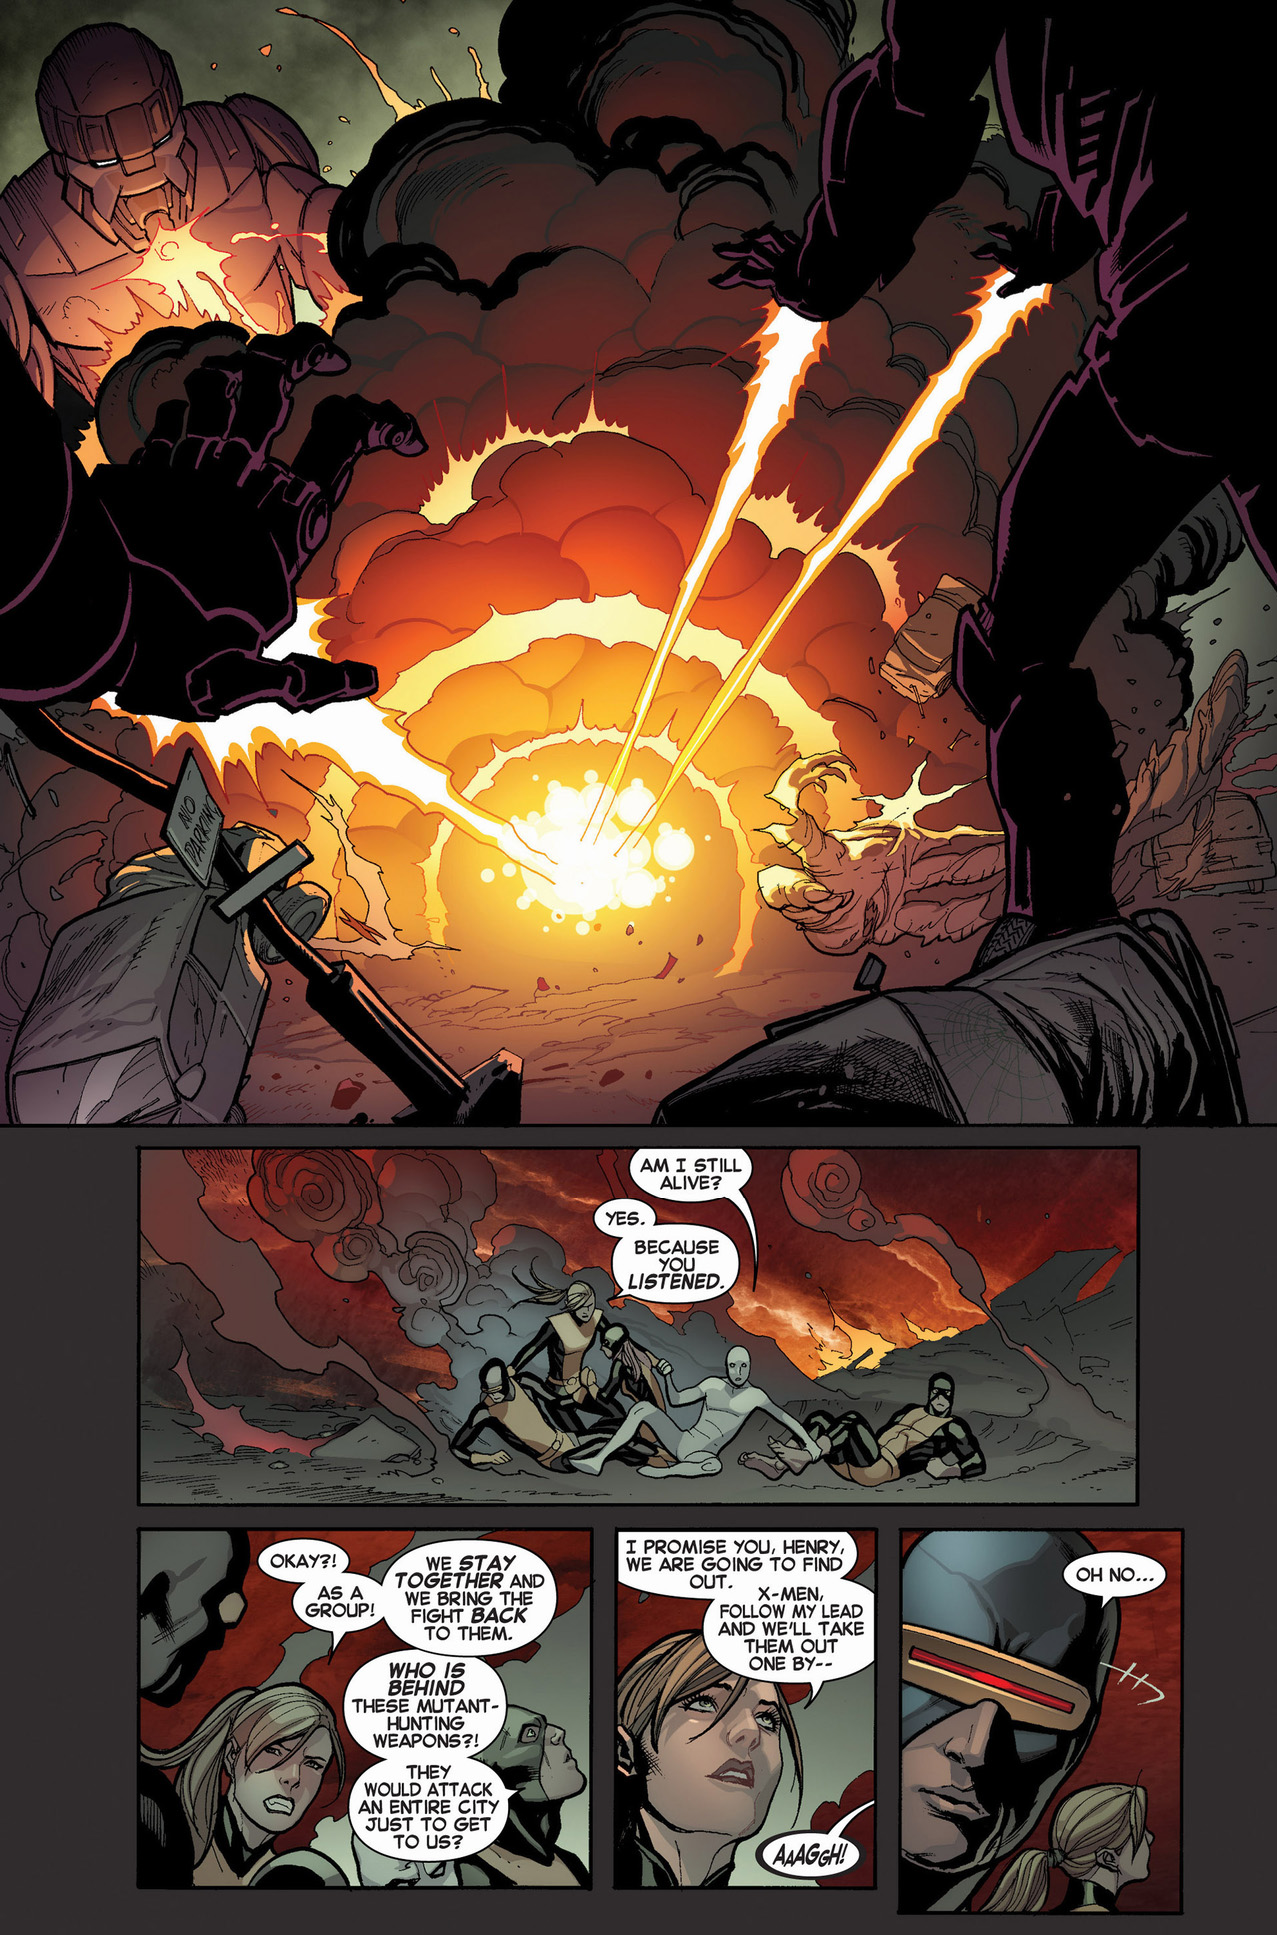 original 5 x-men attacked by sentinels